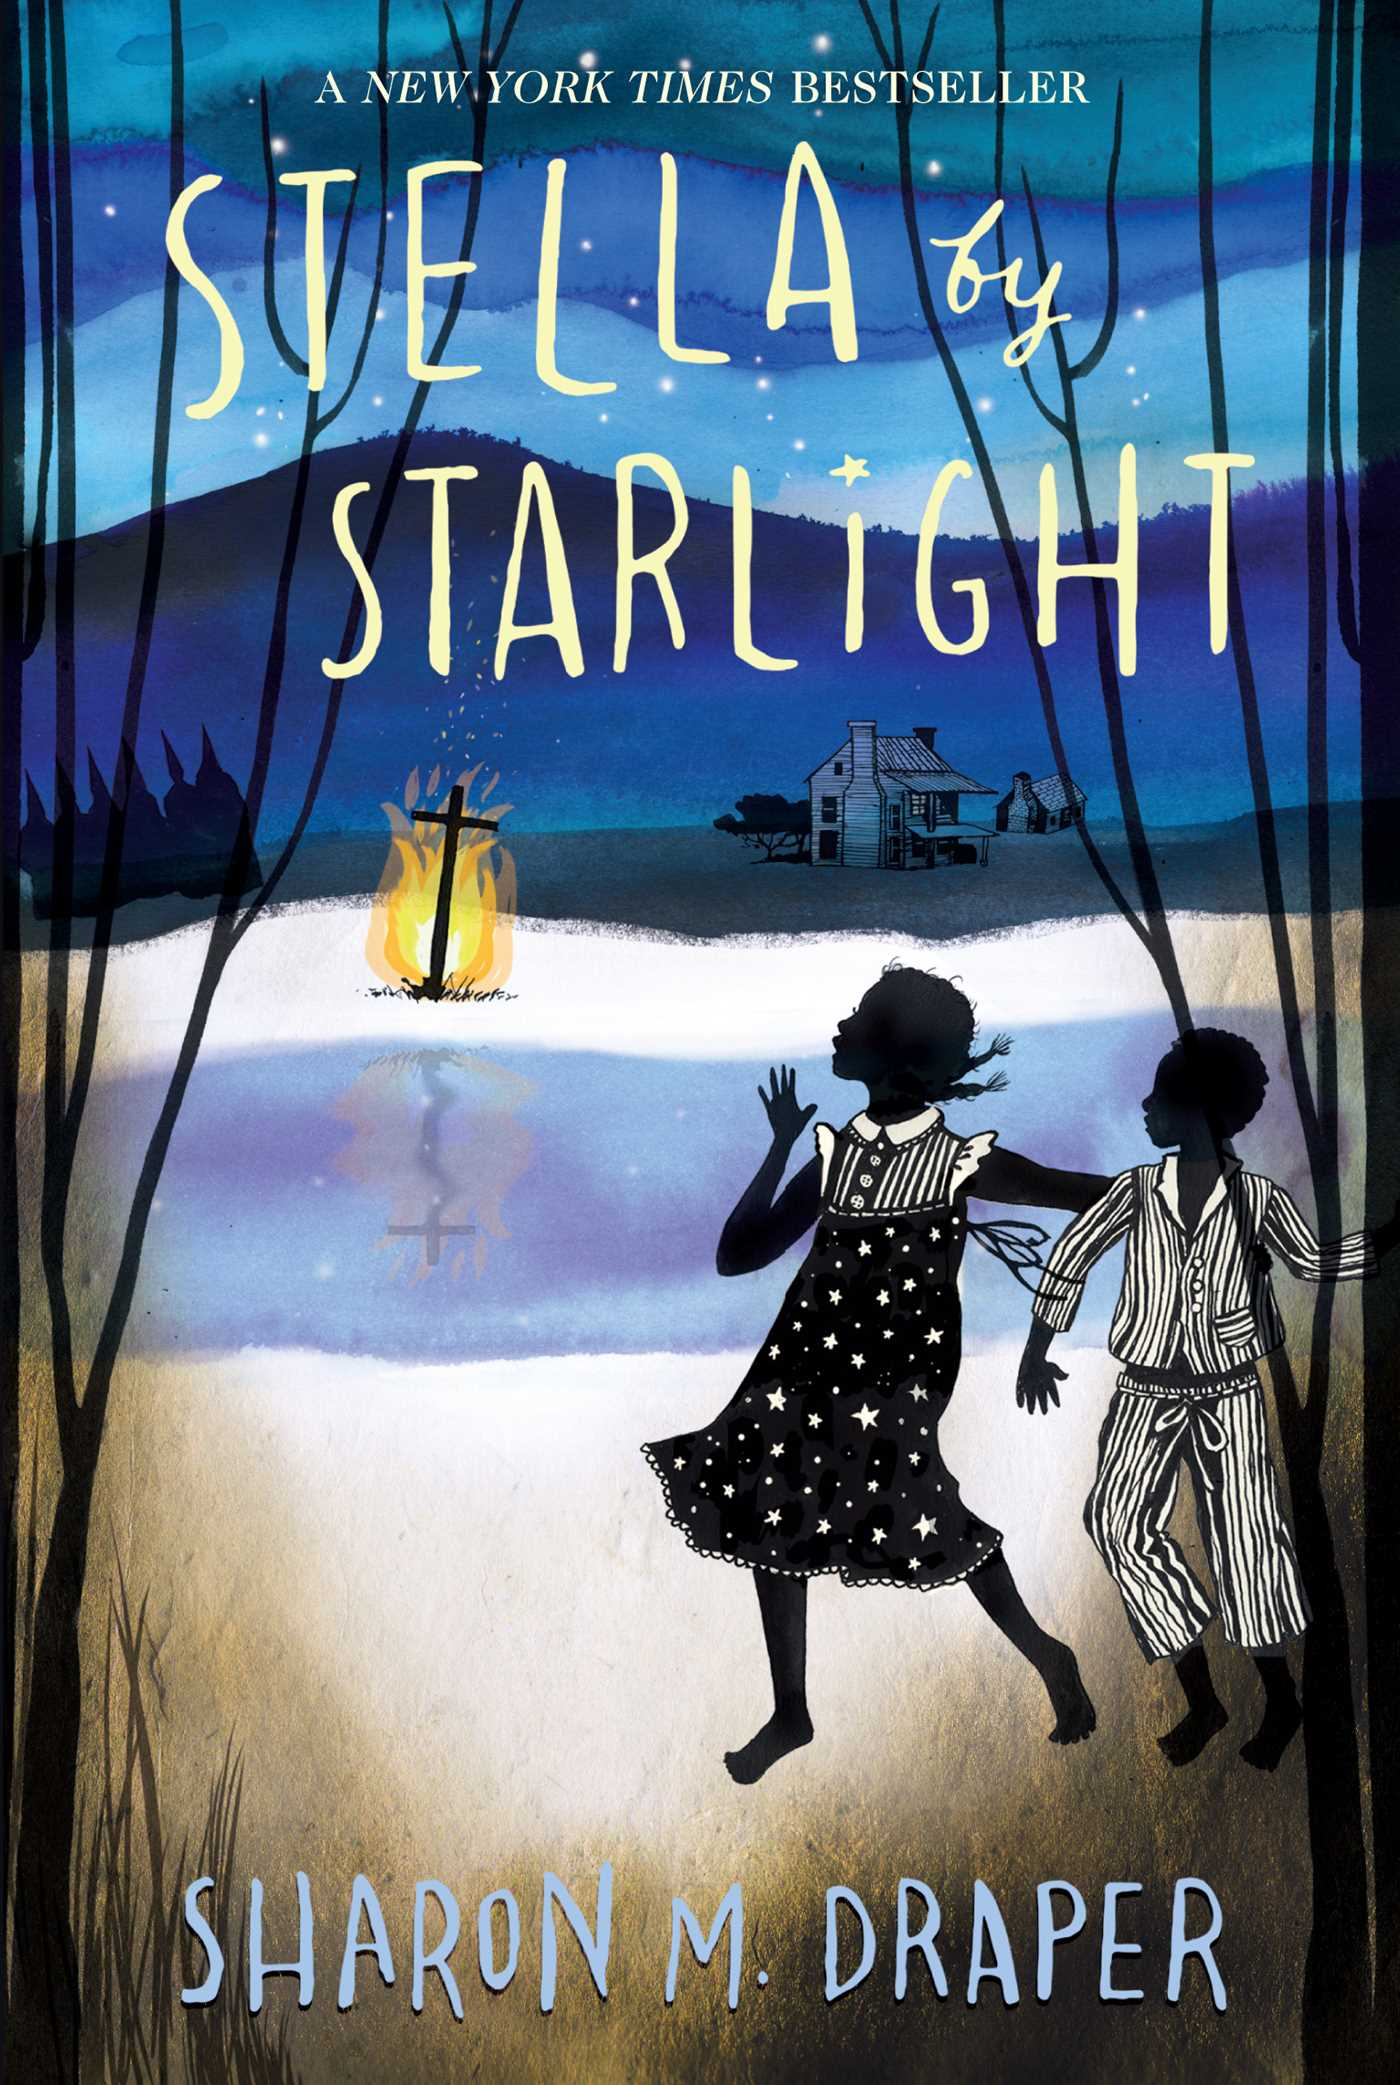 Stella by starlight 9781442494992 hr